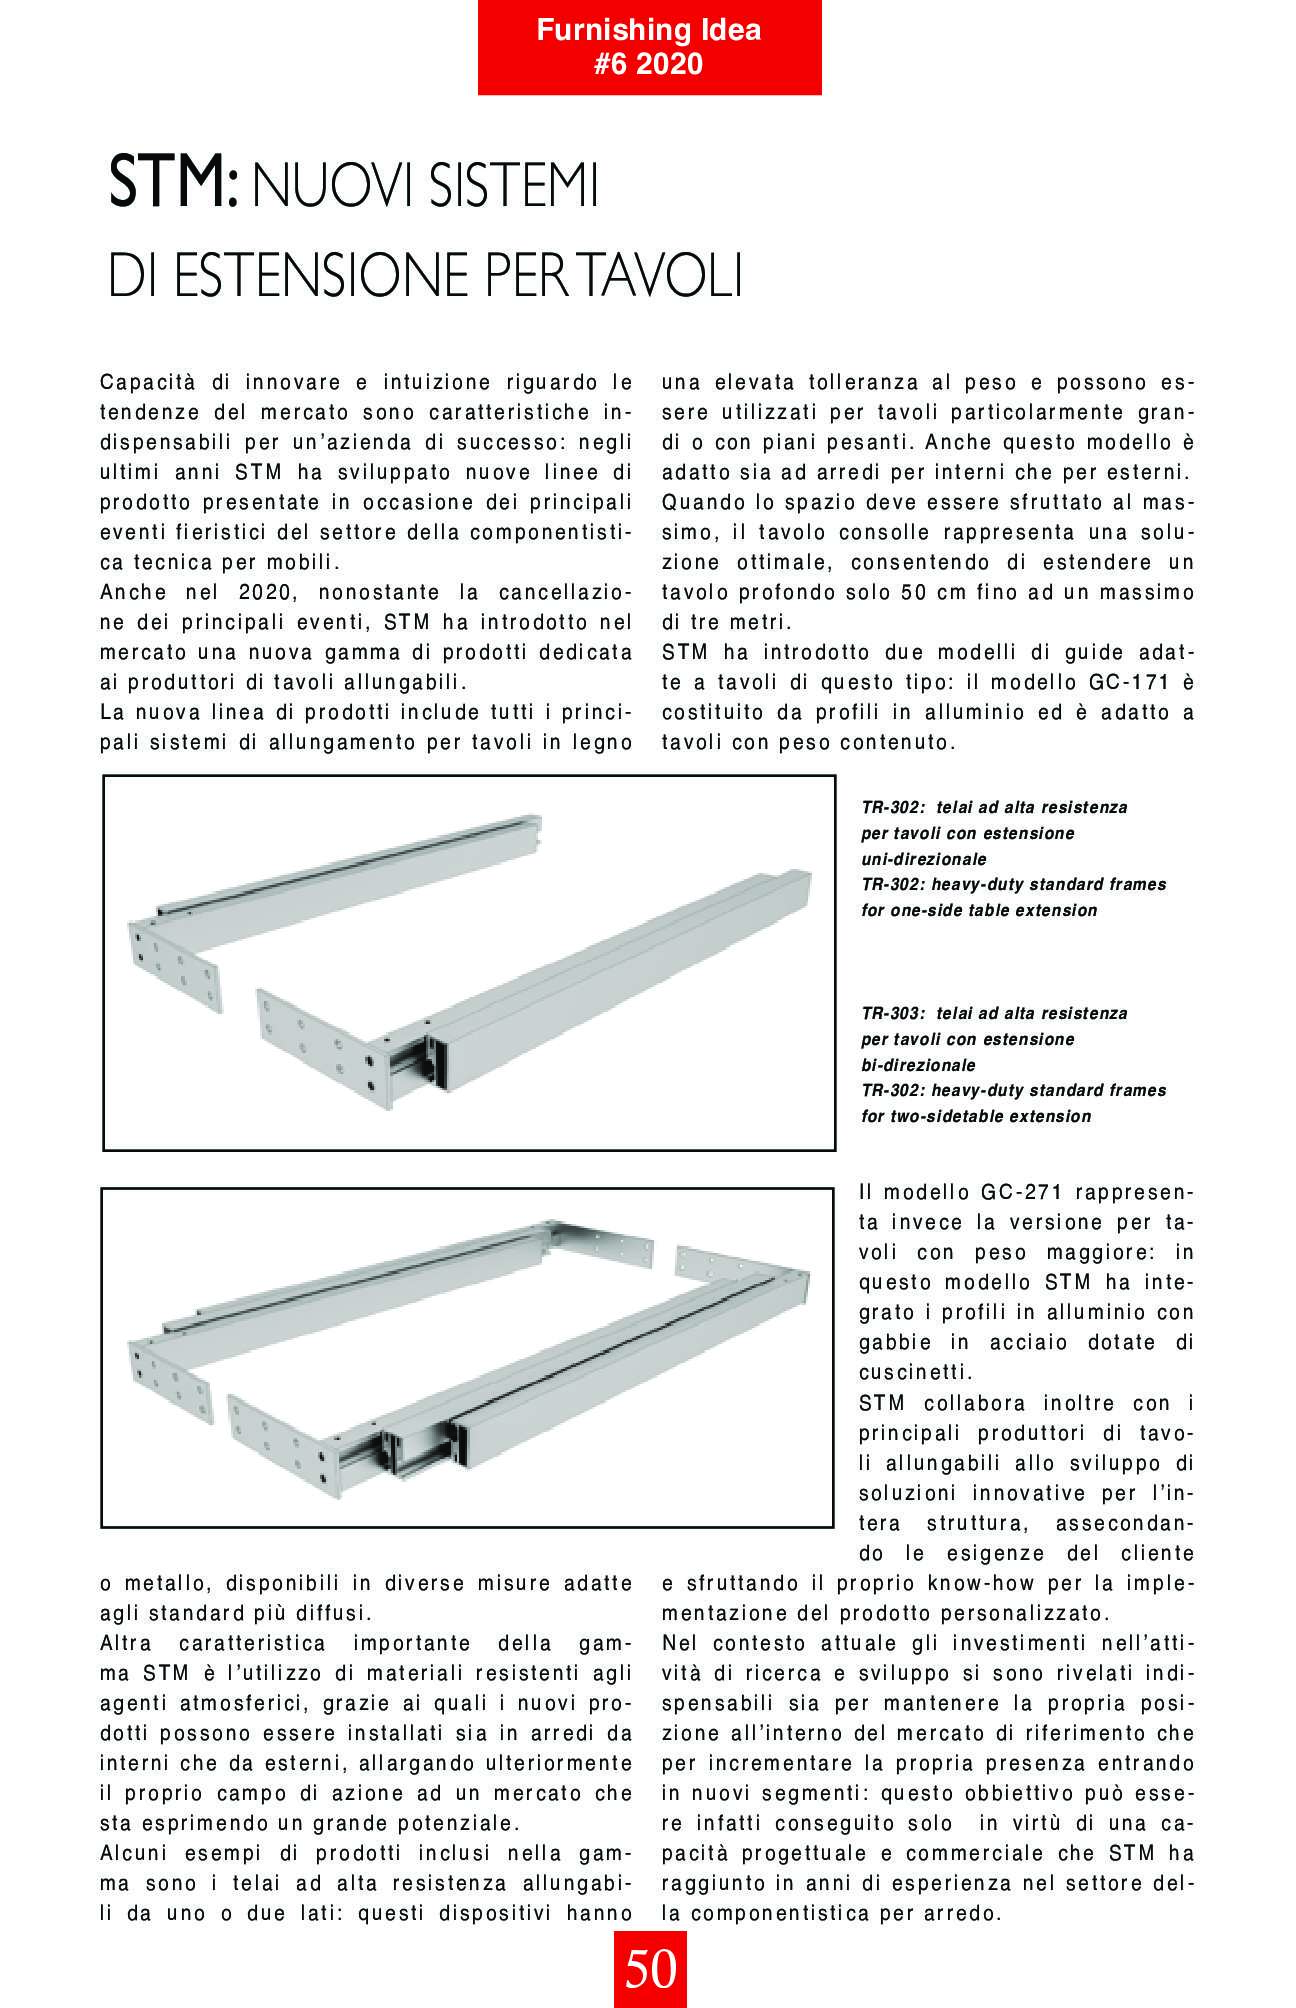 furnishingidea-6-2020_journal_22_049.jpg